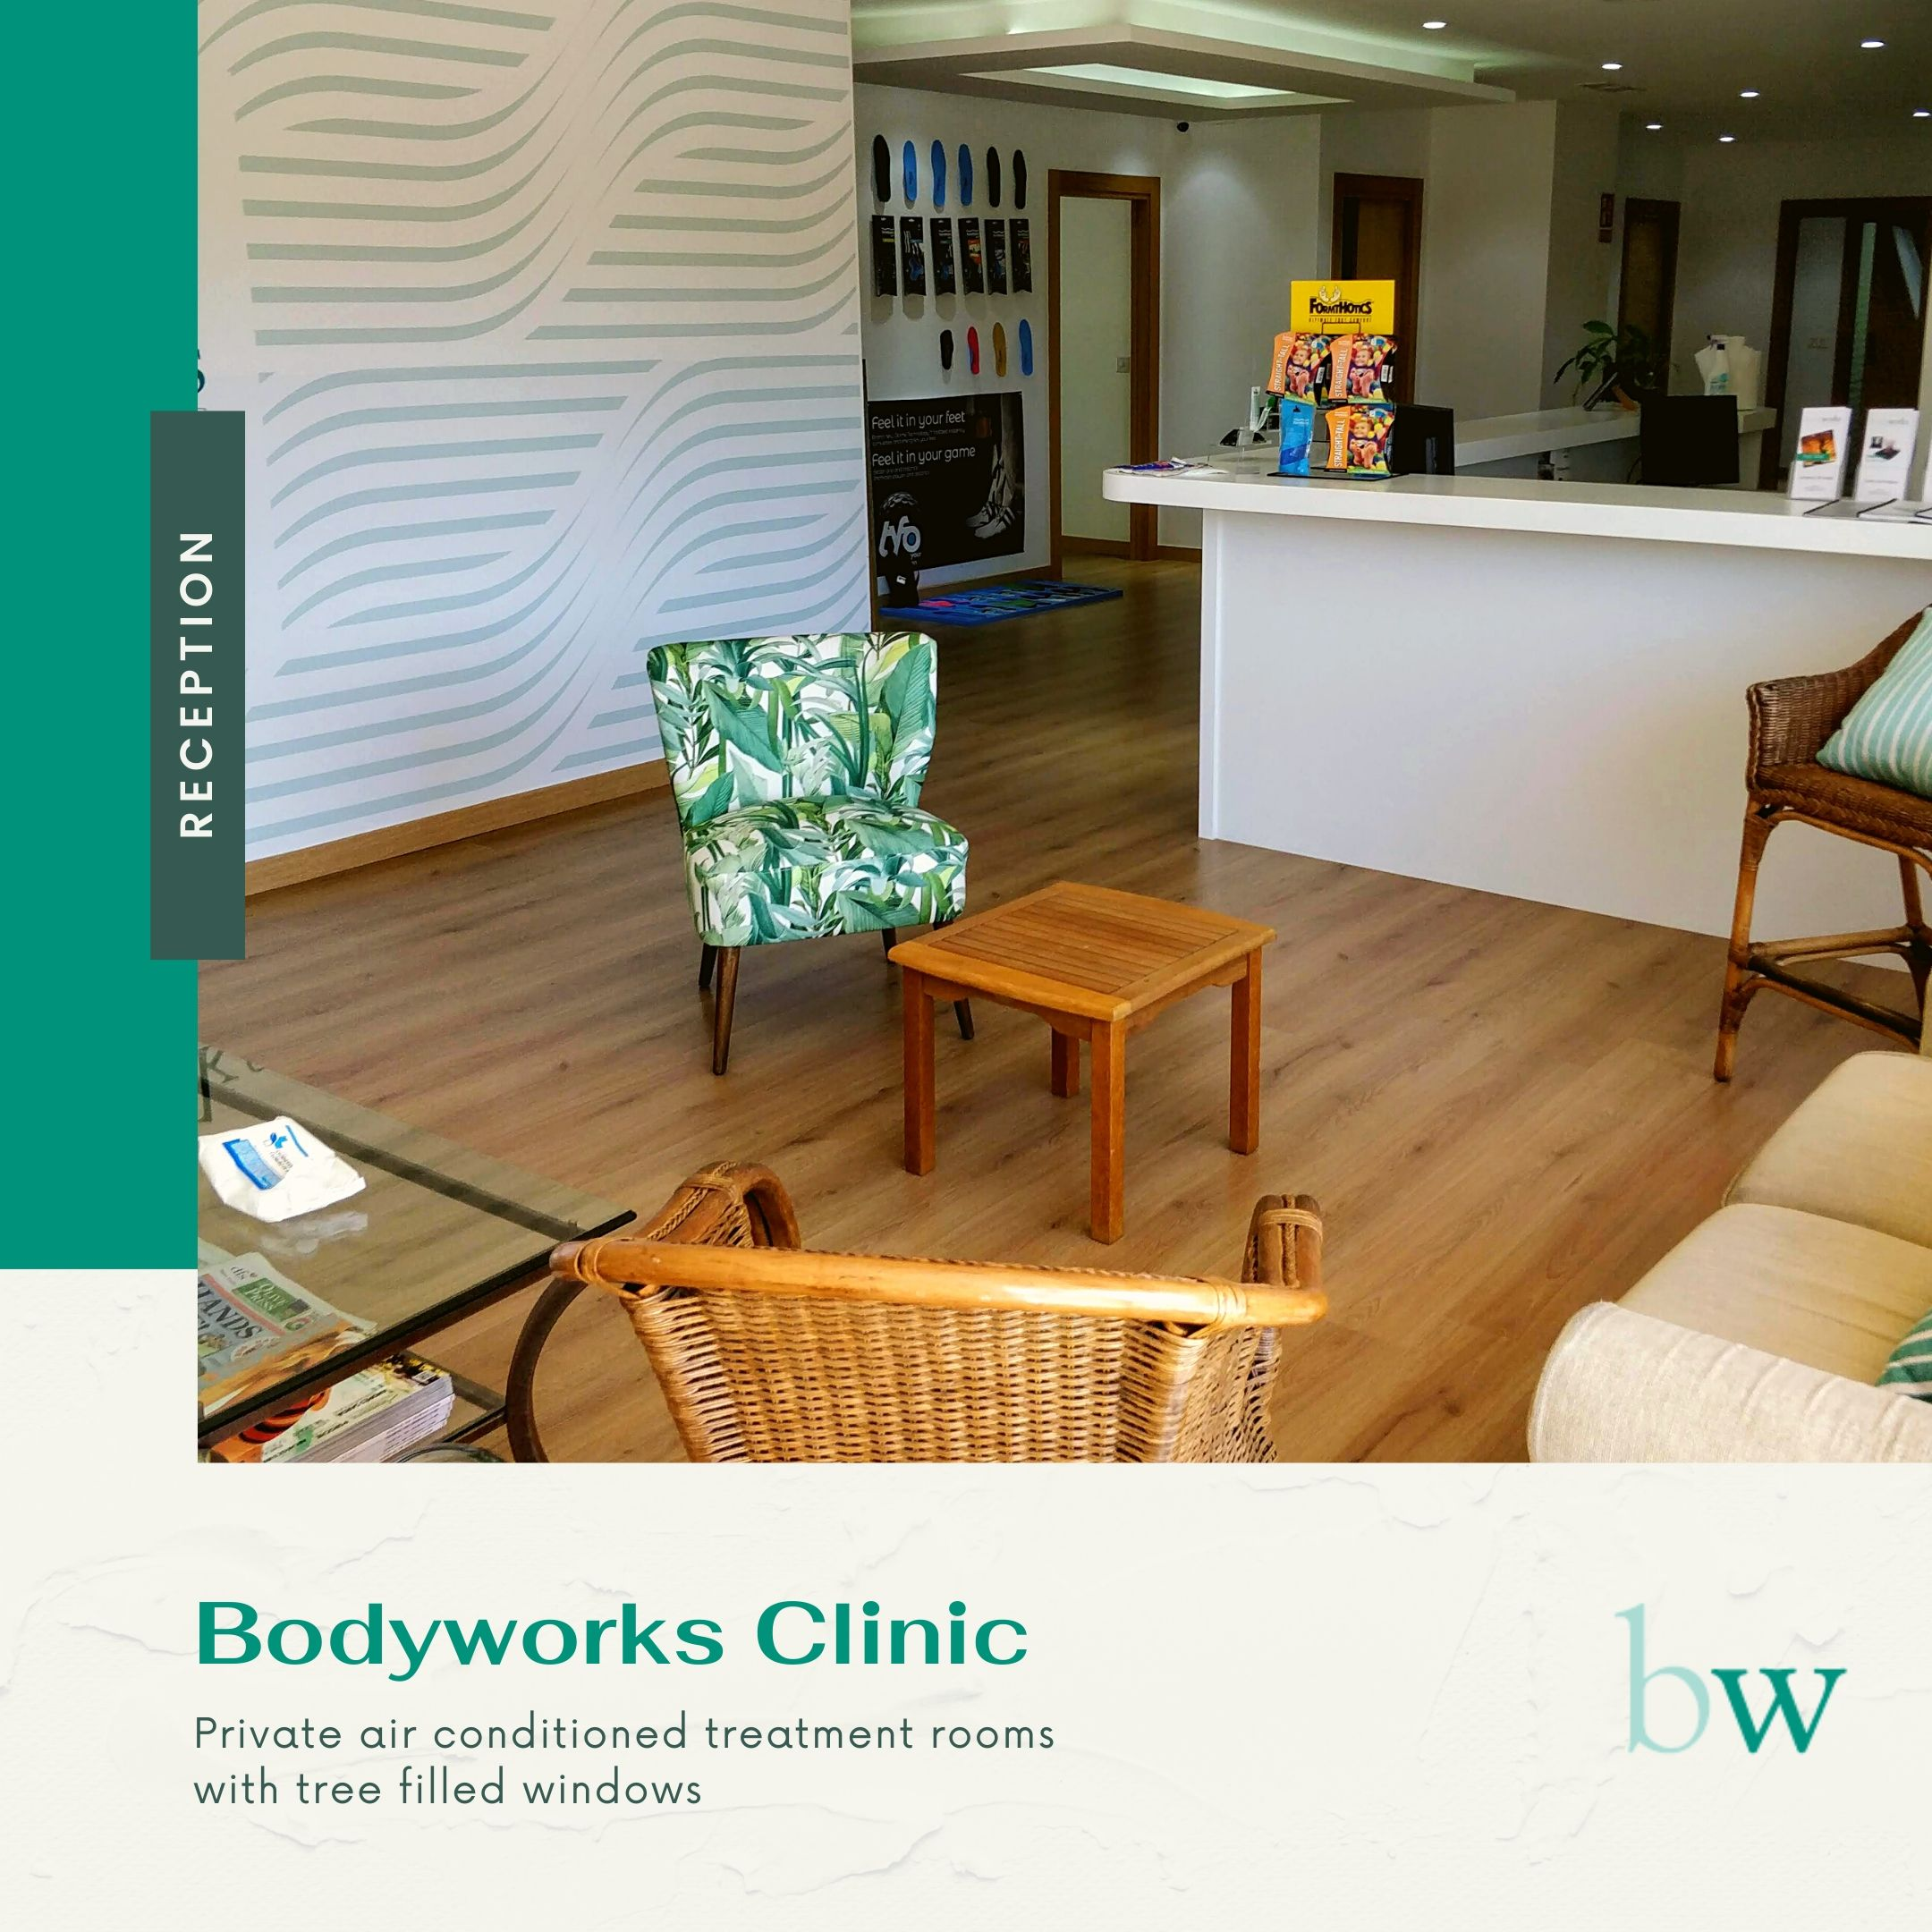 Reception at Bodyworks Clinic Marbella